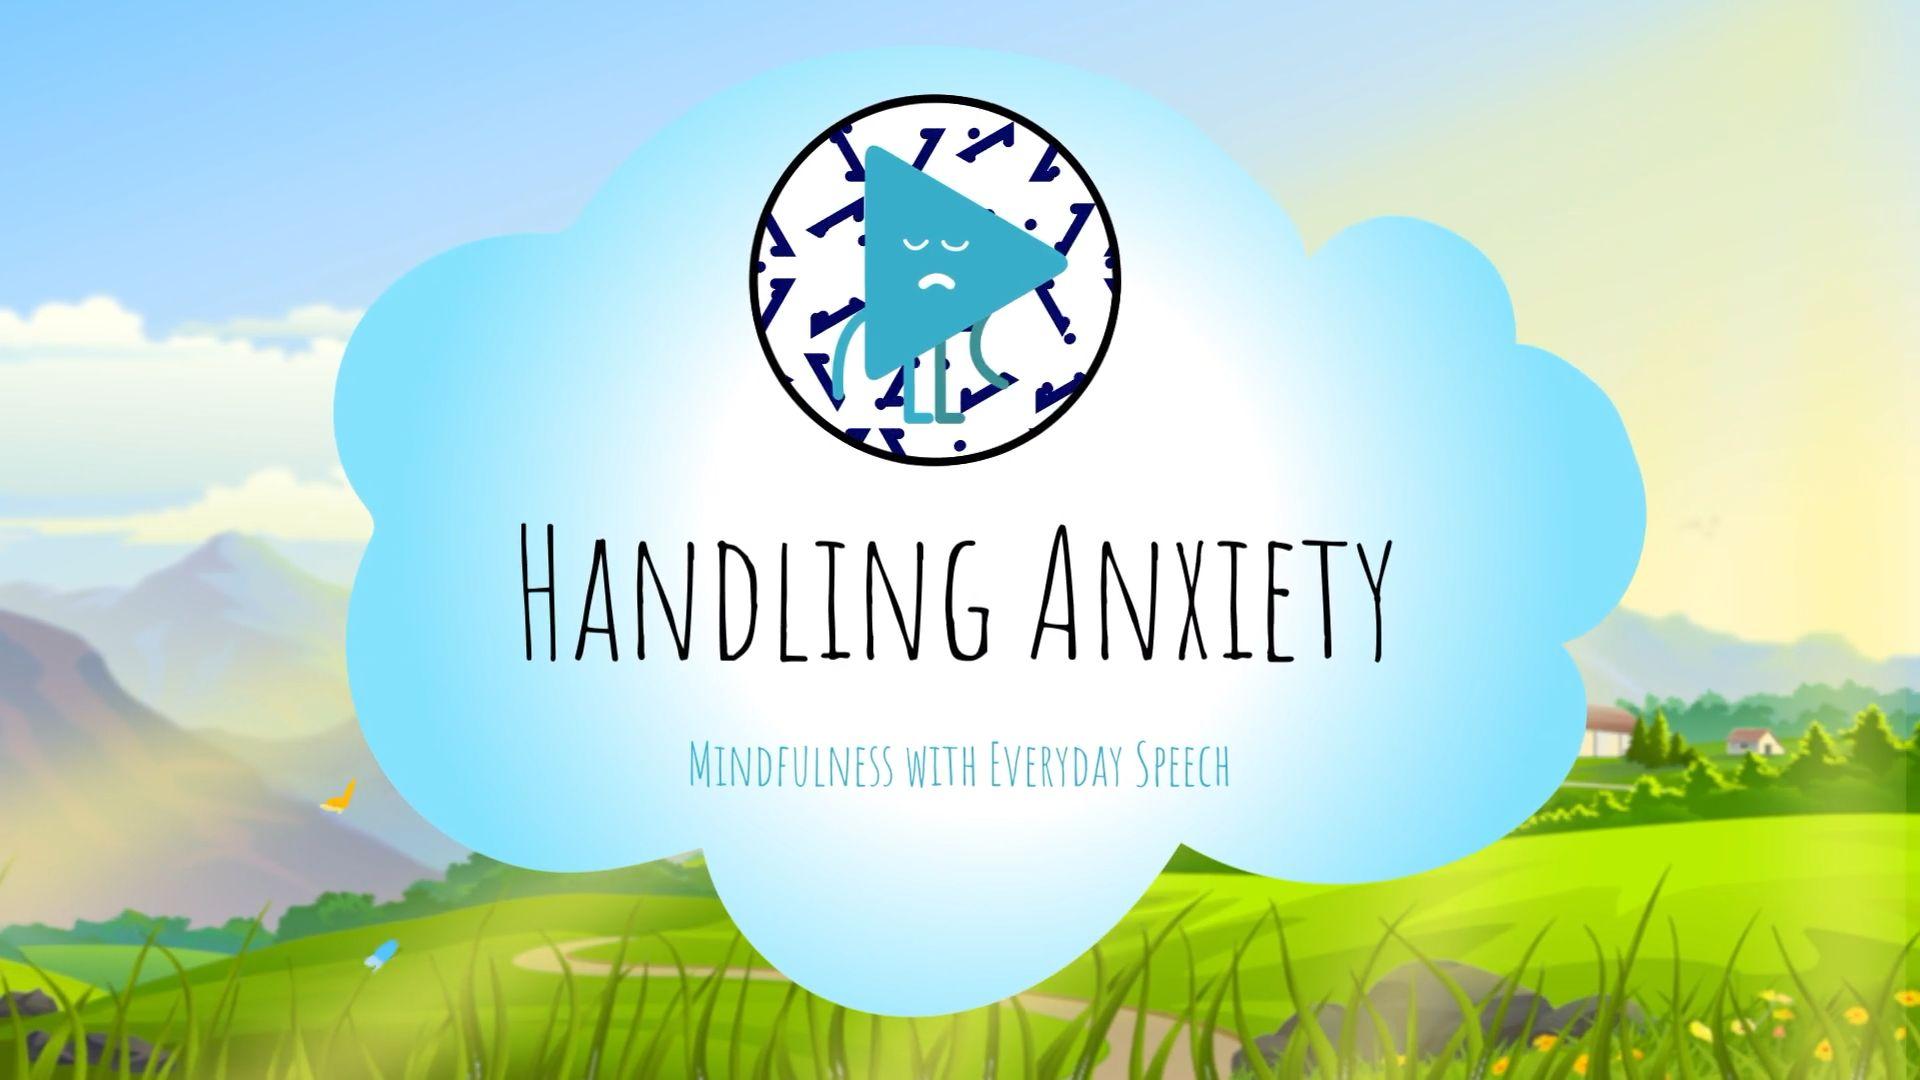 Handling Anxiety